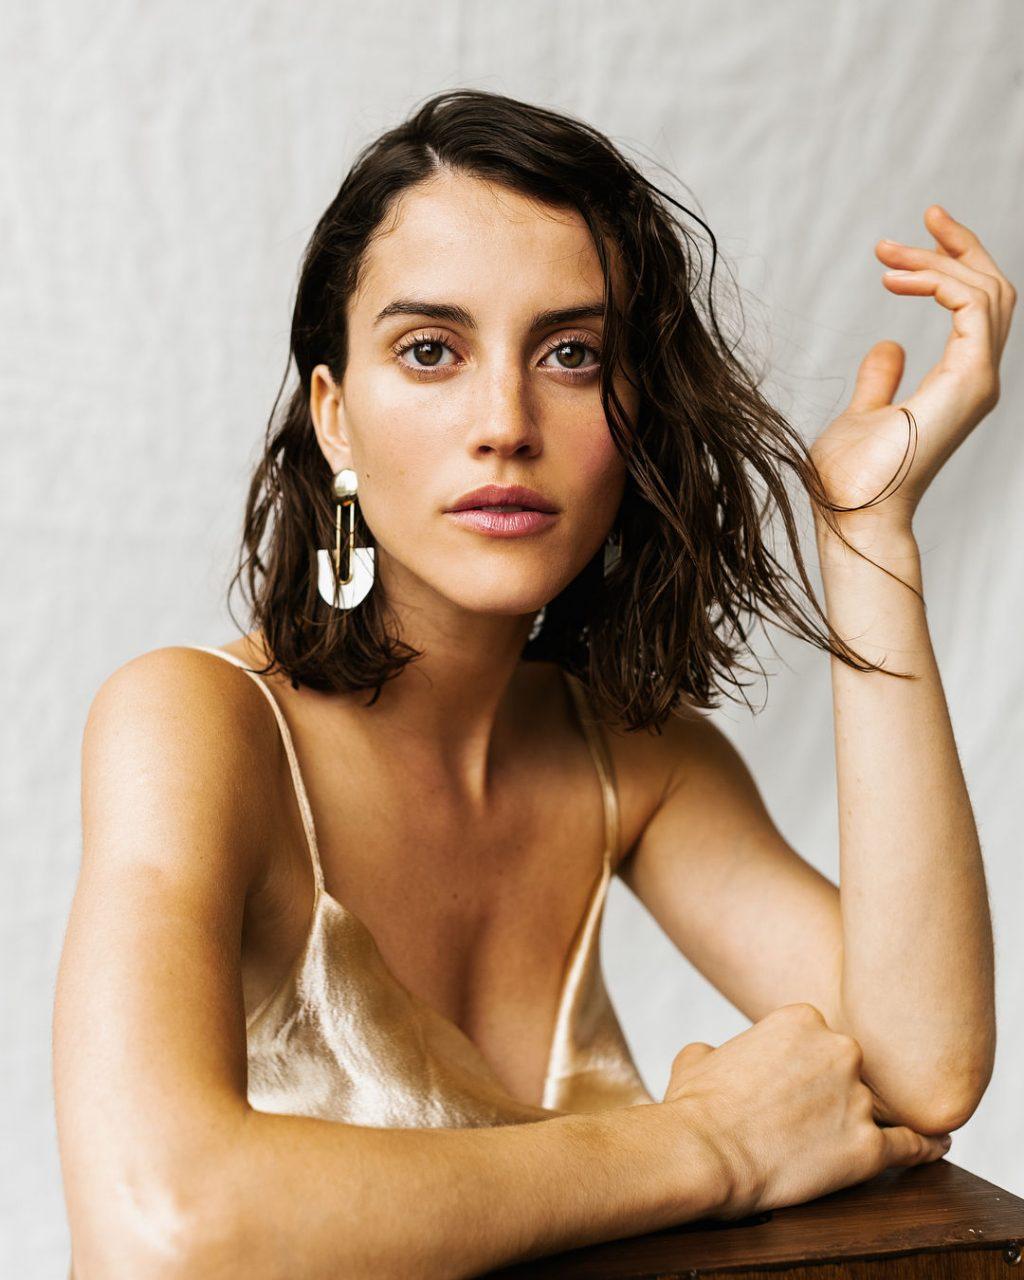 Instagram Clara Rene nude photos 2019